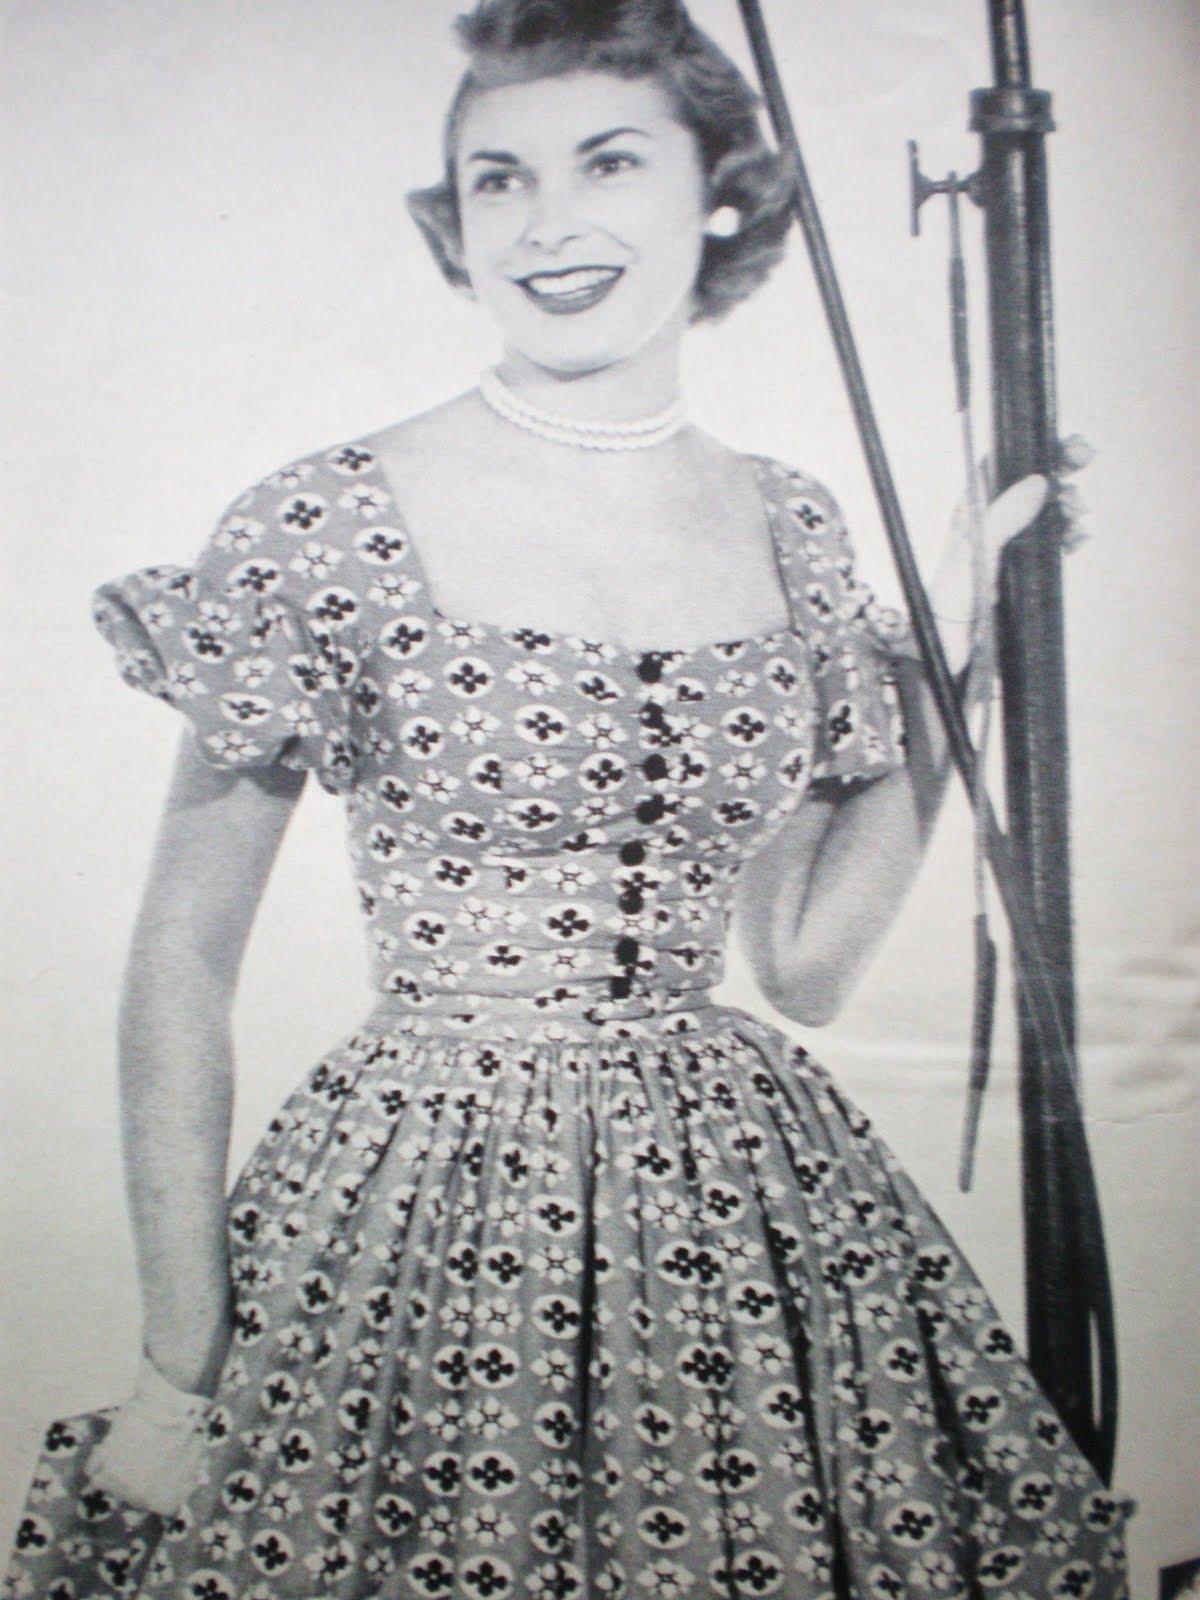 37723399472d 1950 s Vintage Dress Styles  Sew Summer Dresses Now! Liz Taylor Janet Leigh